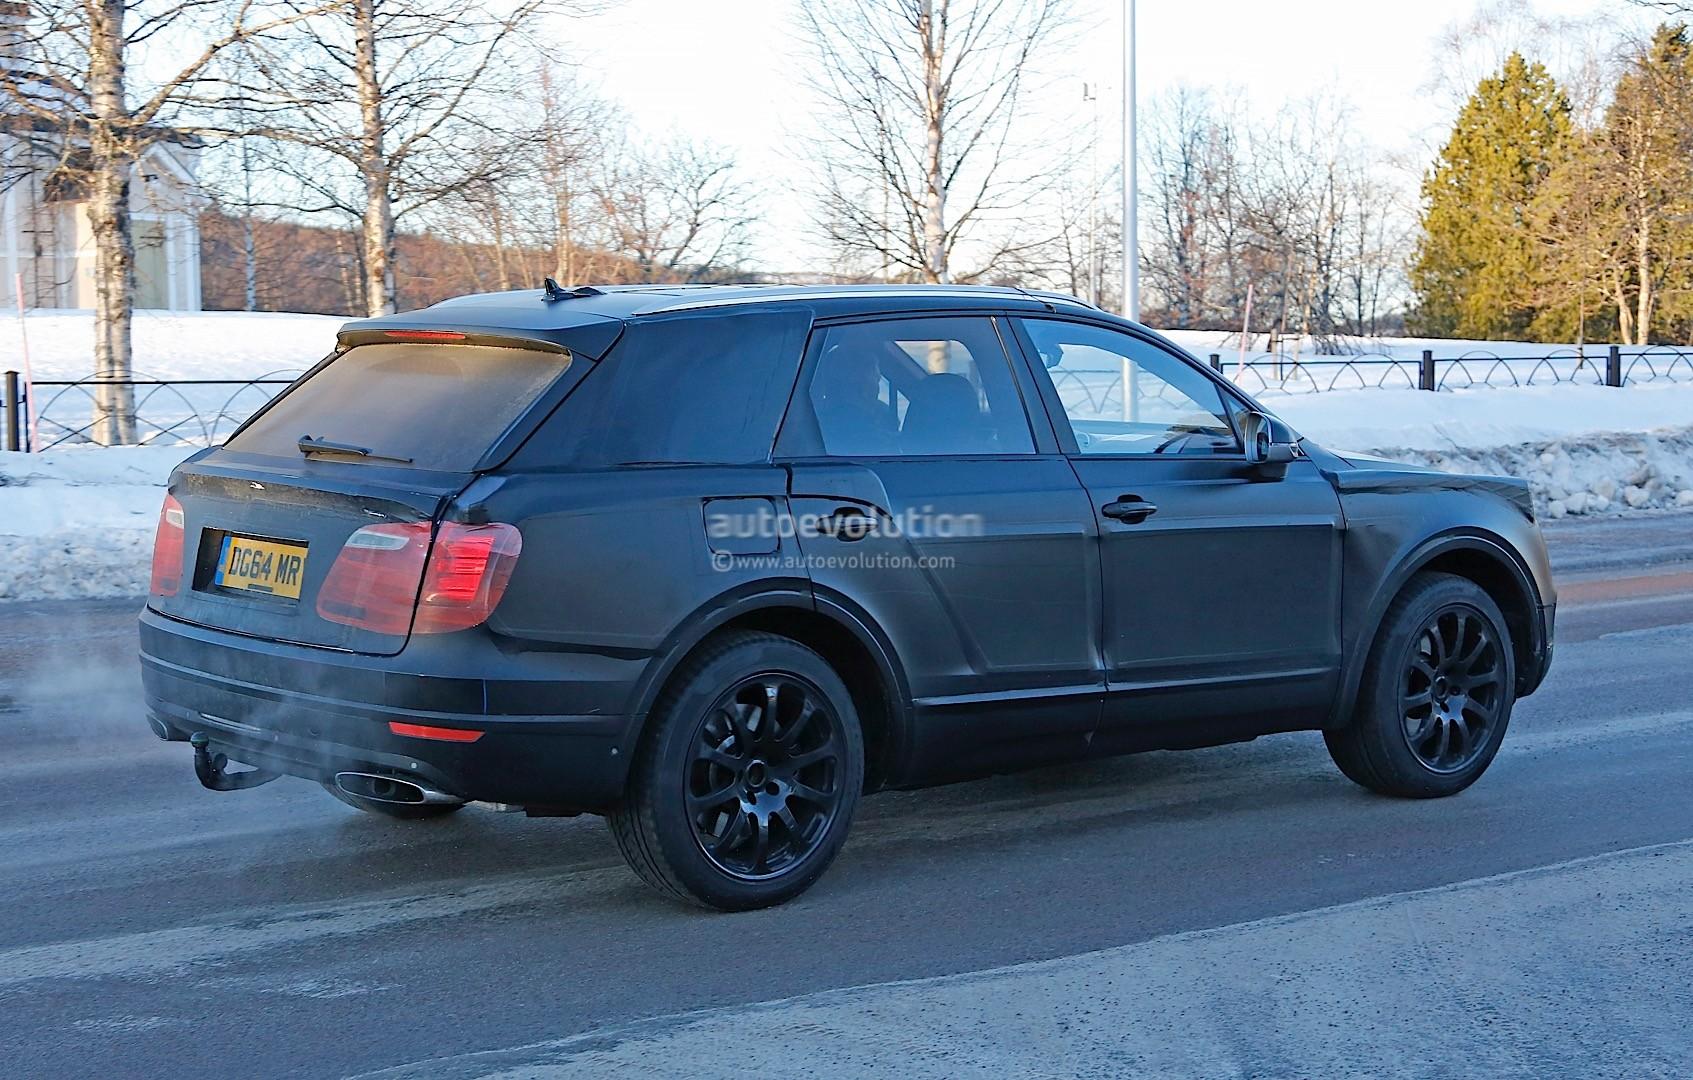 2015 - [Bentley] Bentayga - Page 5 Bentley-bentayga-spied-once-again-looks-like-an-edgier-vw-touareg-photo-gallery_7